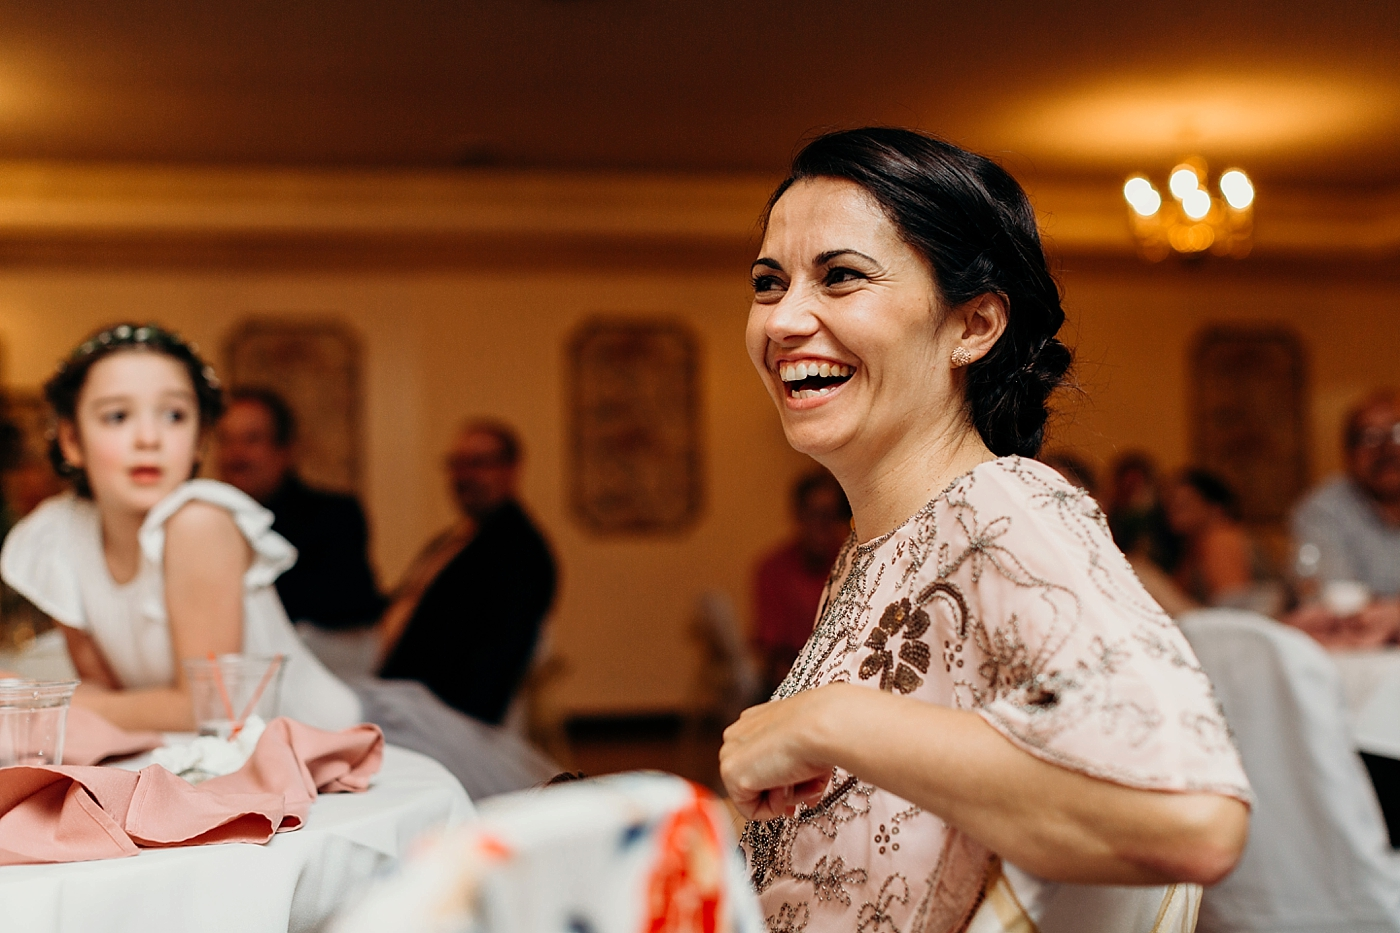 Chateau-Michelle-Wedding-Julia+JuanLuis_TheHeartlandersCo2018LA-355.jpg